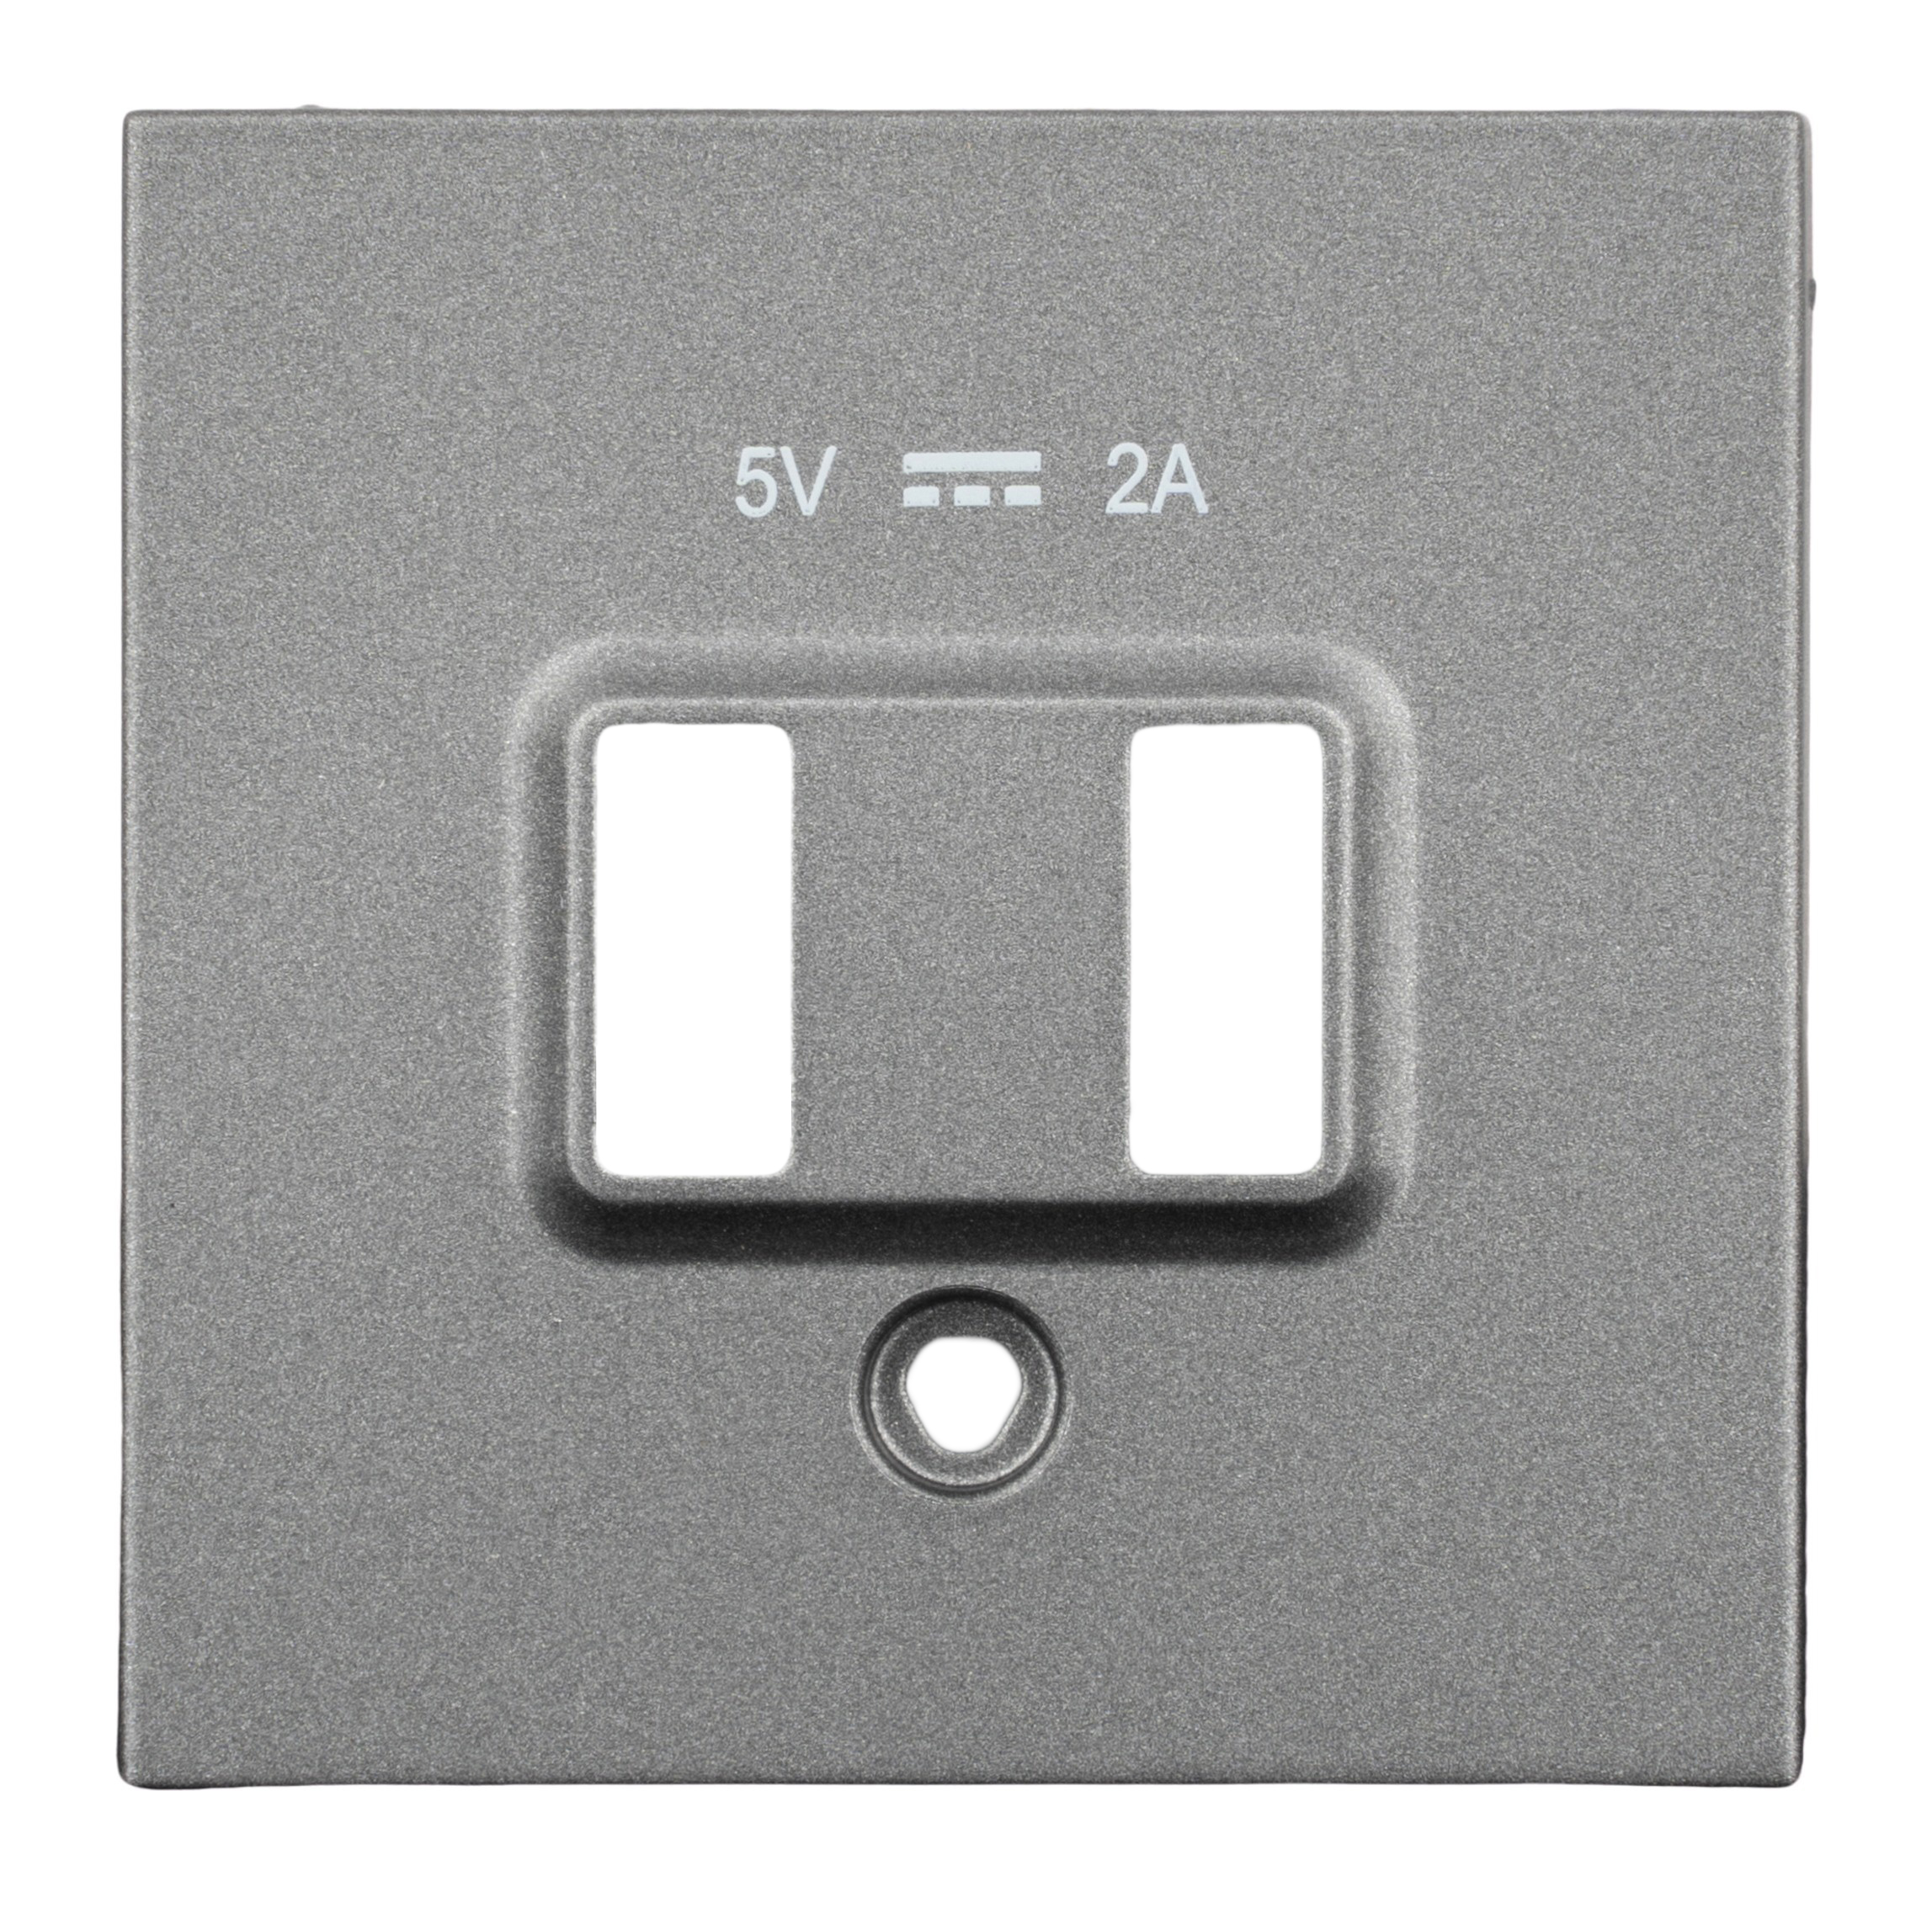 1 Stk USB Ladesteckdosen-Abdeckung, anthrazit EV113052--